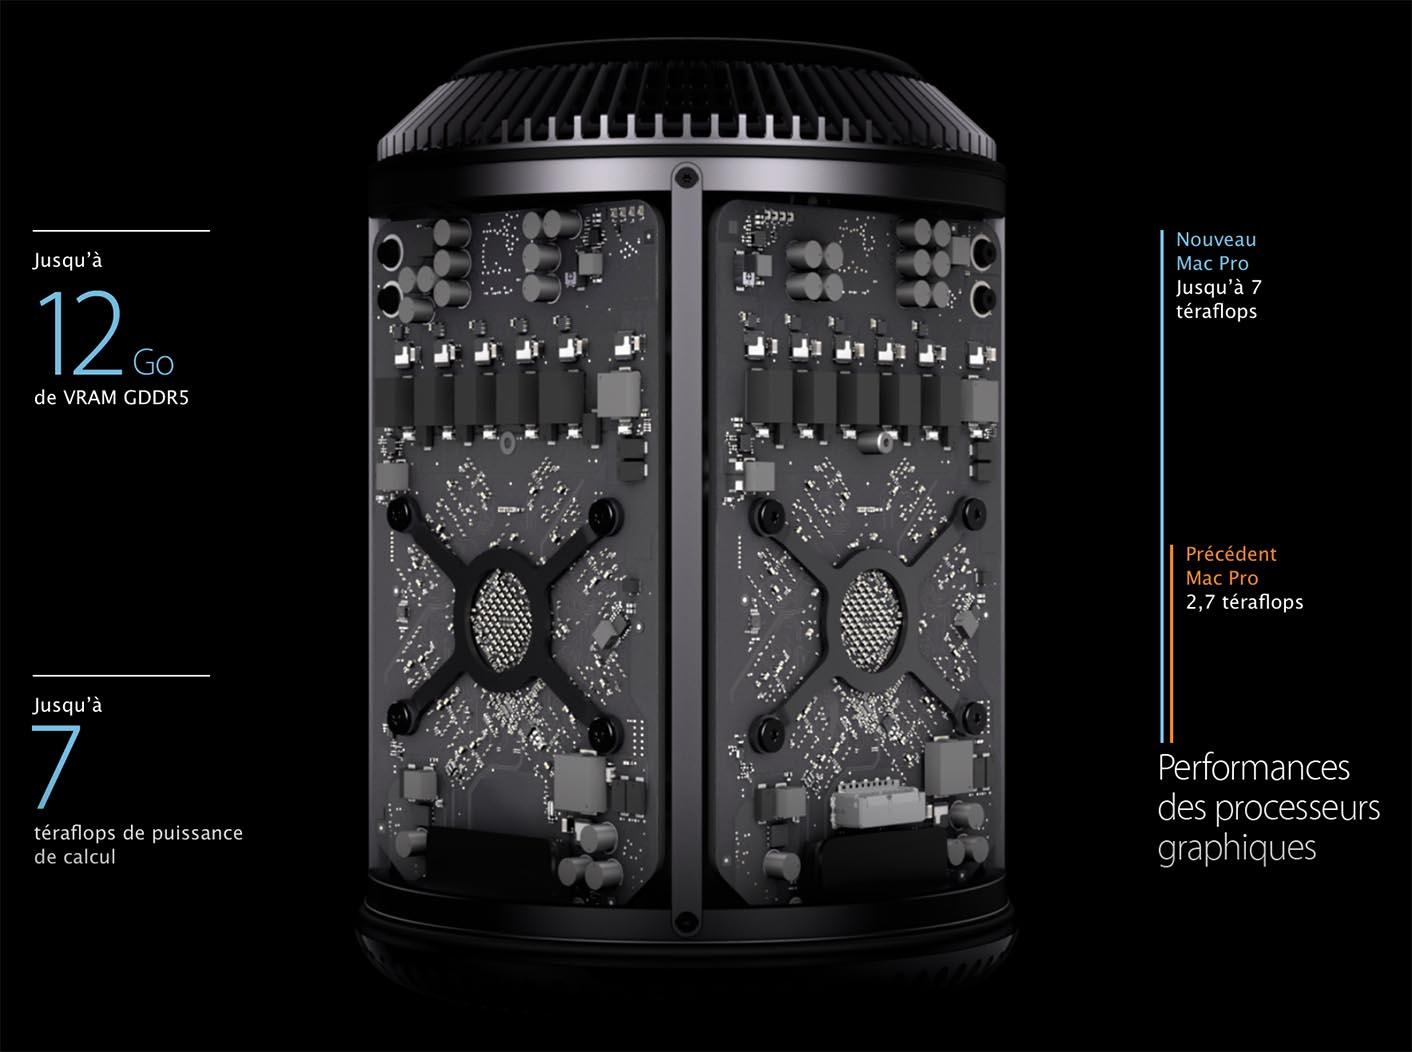 Mac Pro 2013 GPU